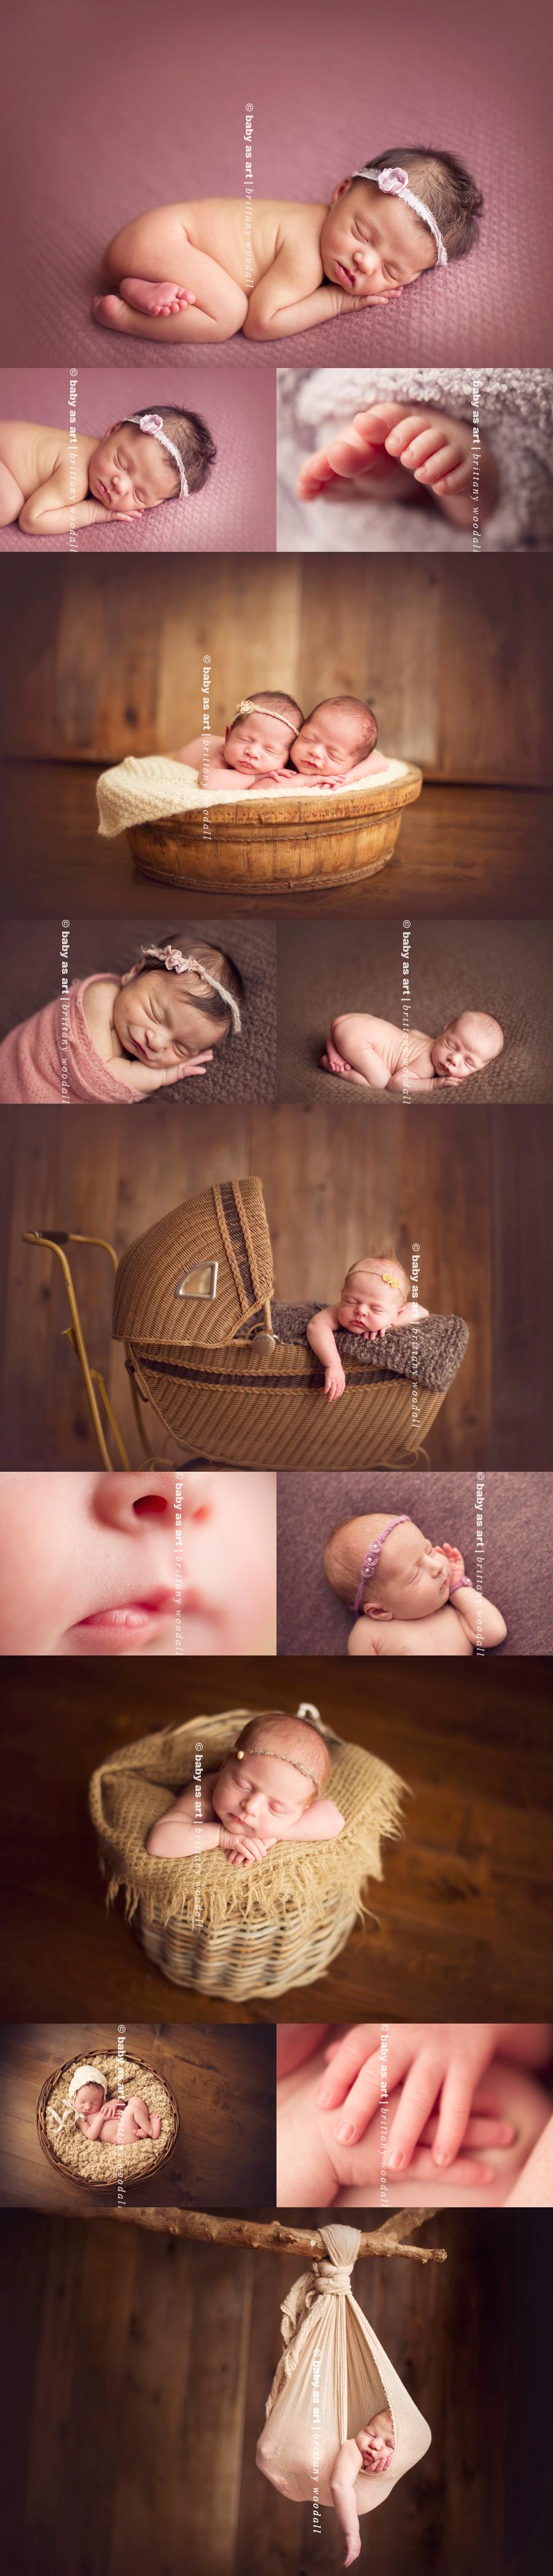 wonderful baby portraits!